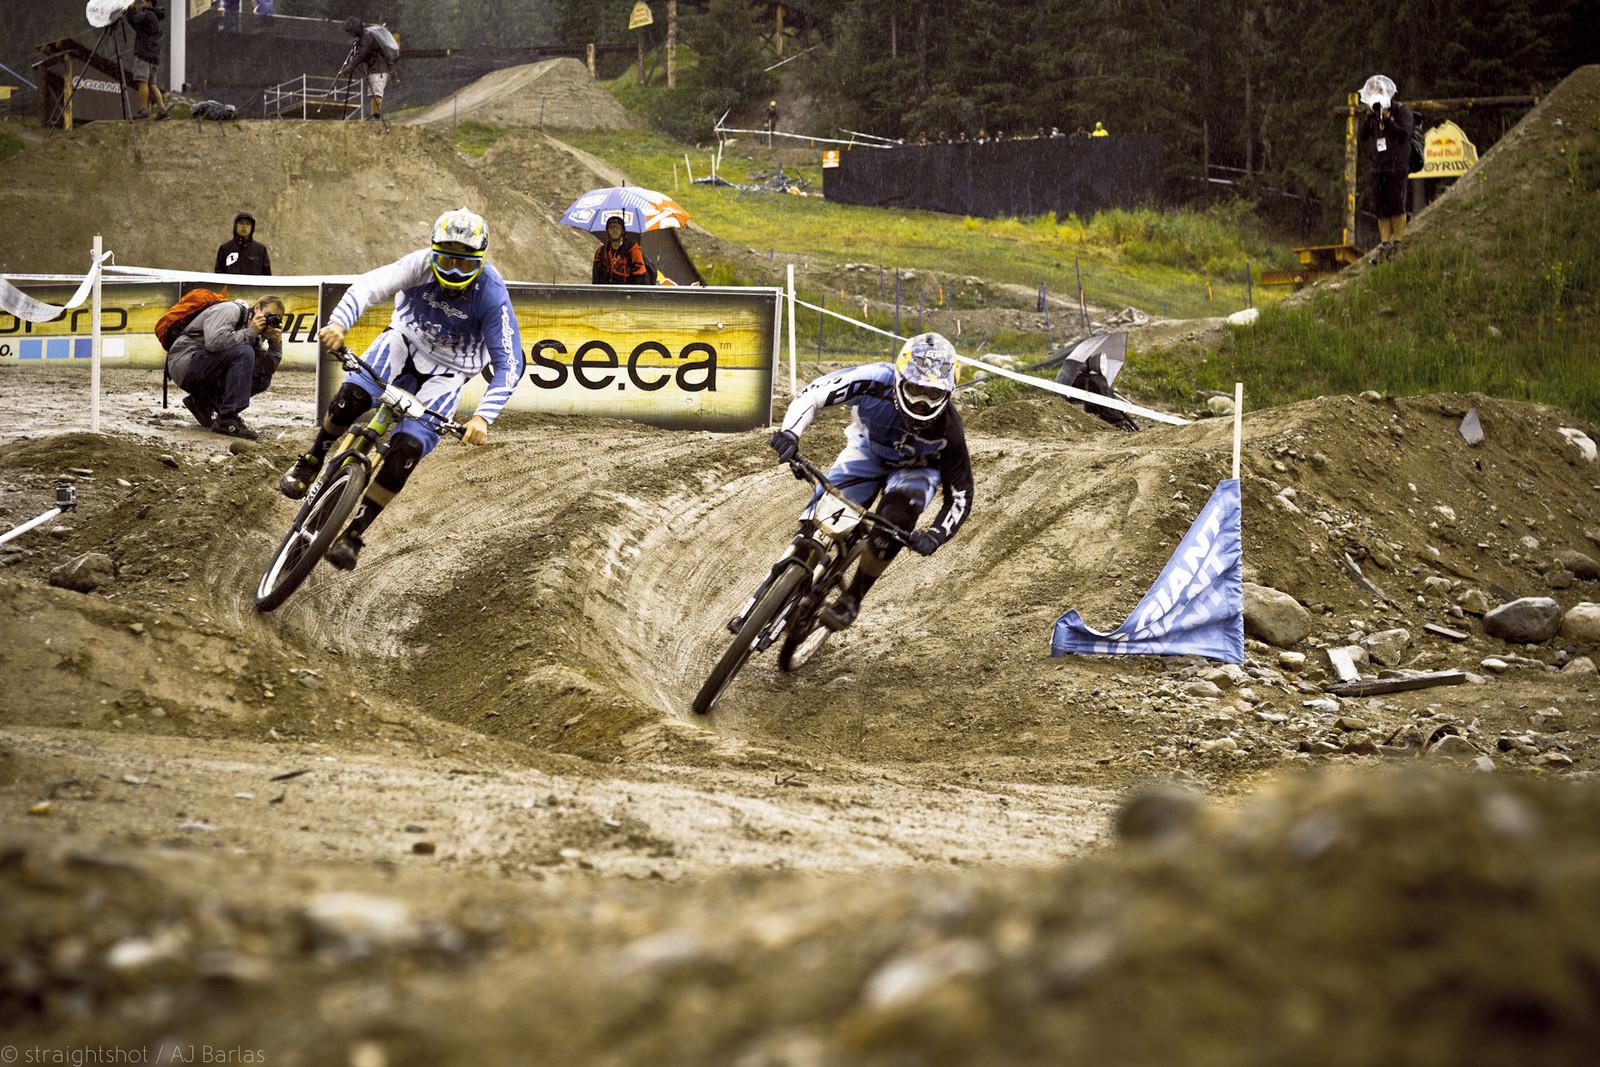 Brendon Fairclough was Knocked out to Early - Crankworx Slalom 2013 - Mountain Biking Pictures - Vital MTB